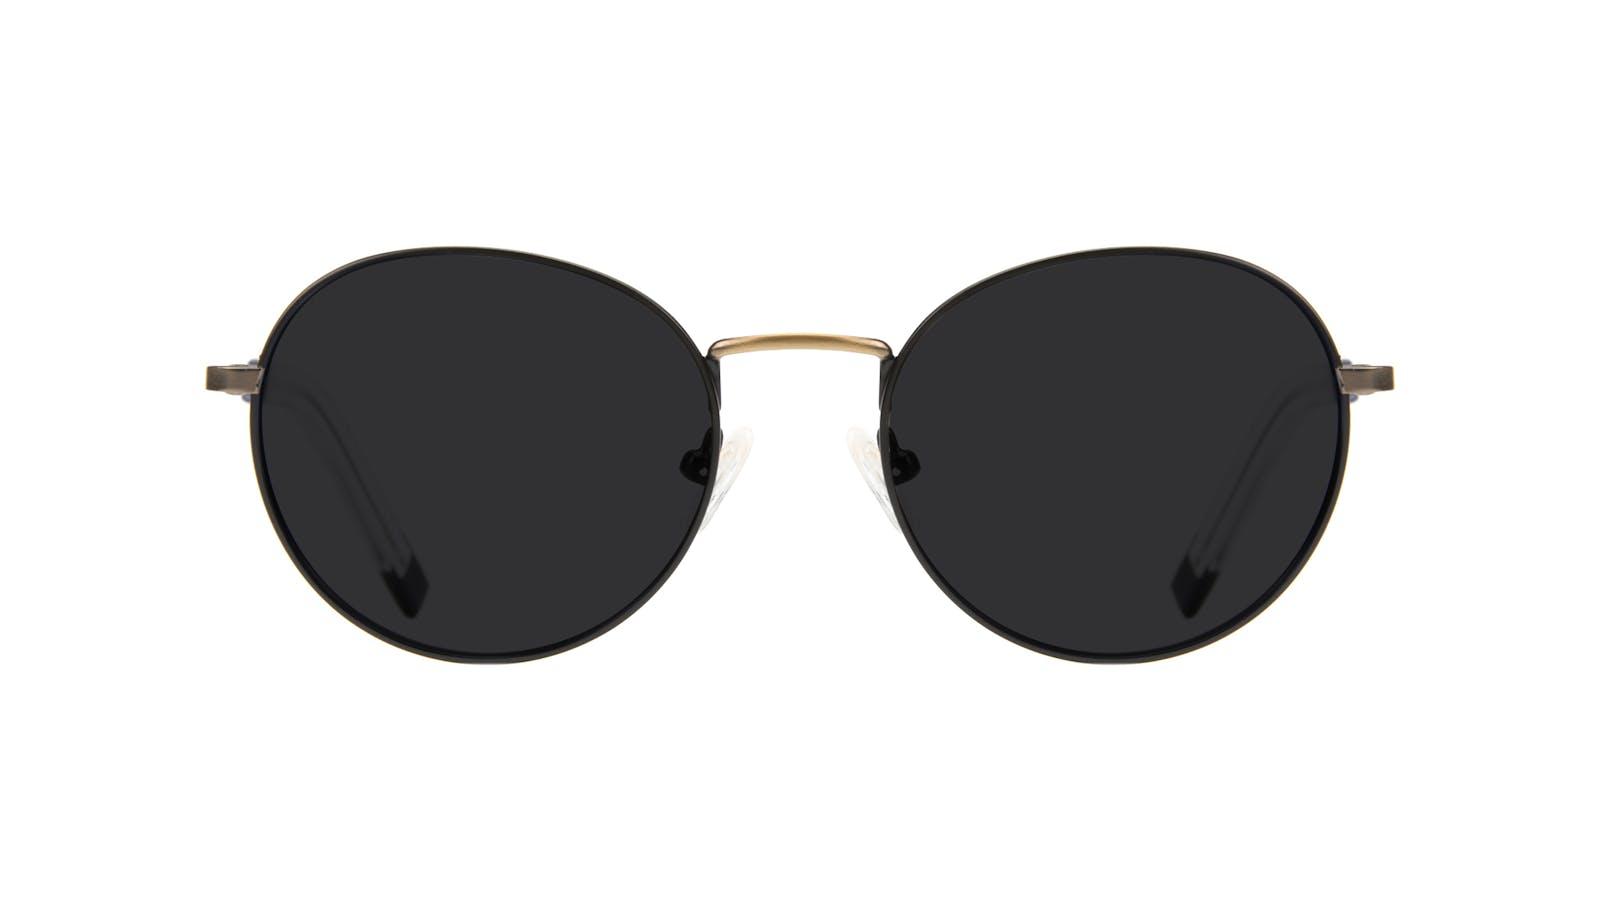 04b55a741fc Affordable Fashion Glasses Round Sunglasses Men Lean Dark Brass